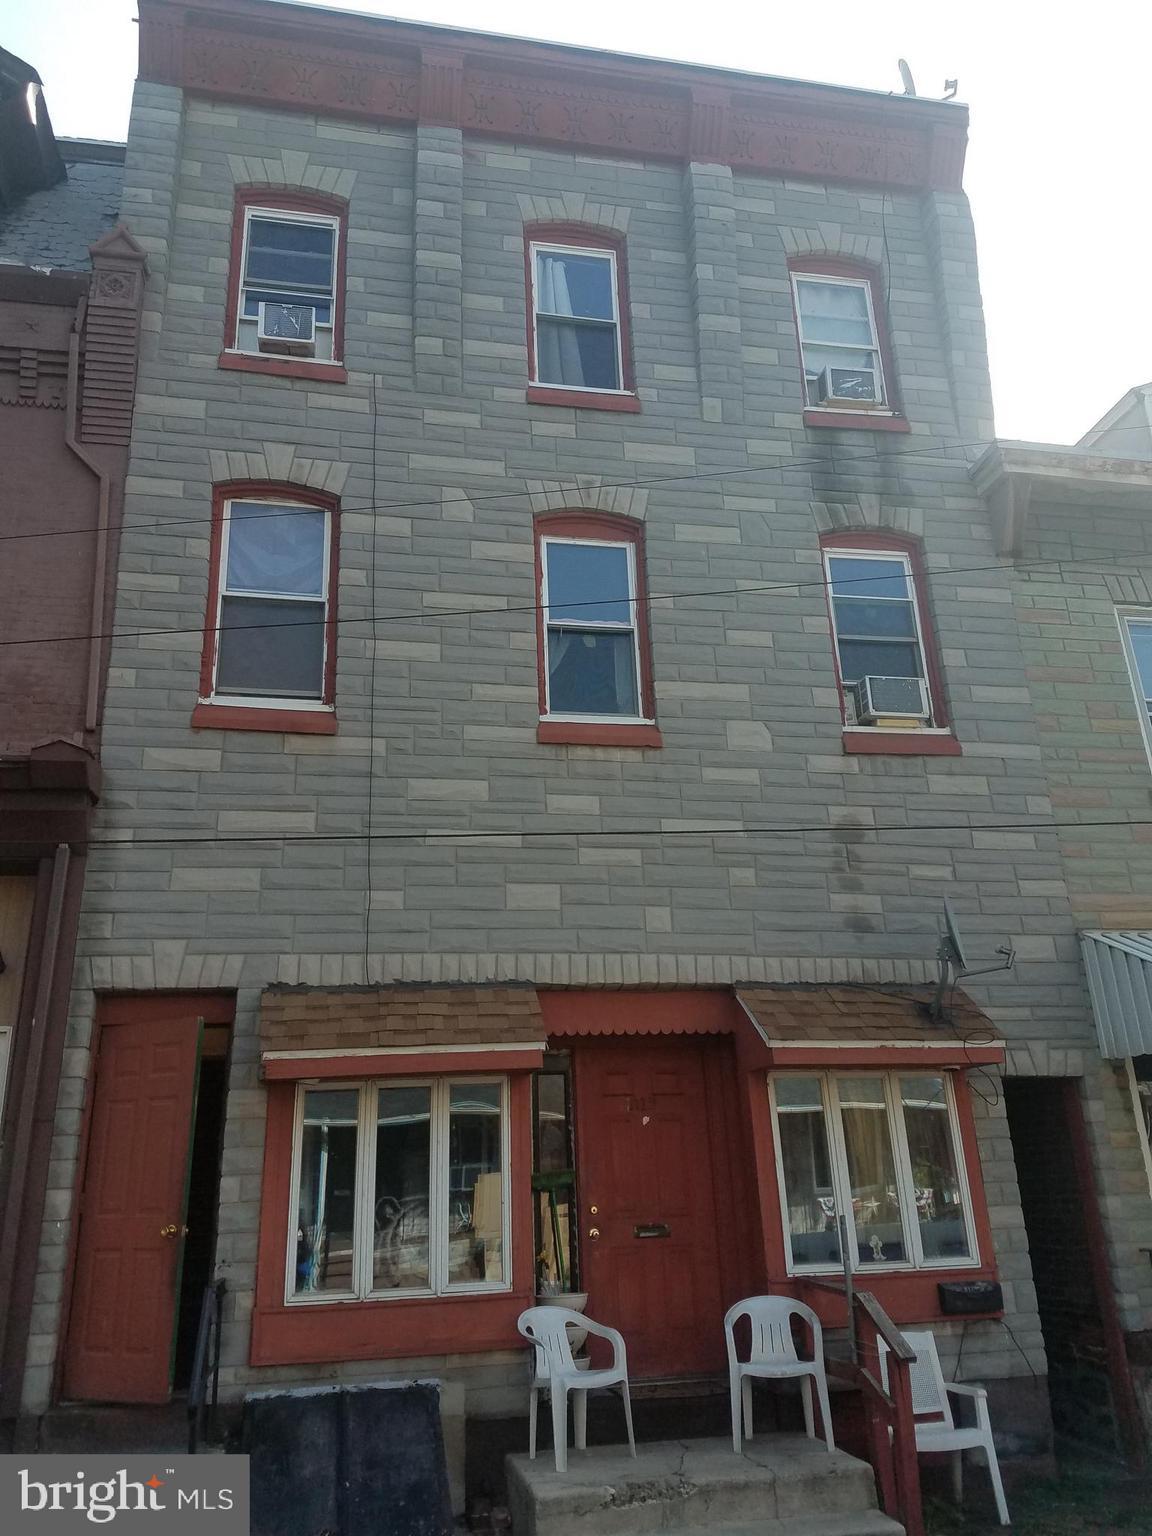 1113 N 9TH STREET, READING, PA 19604